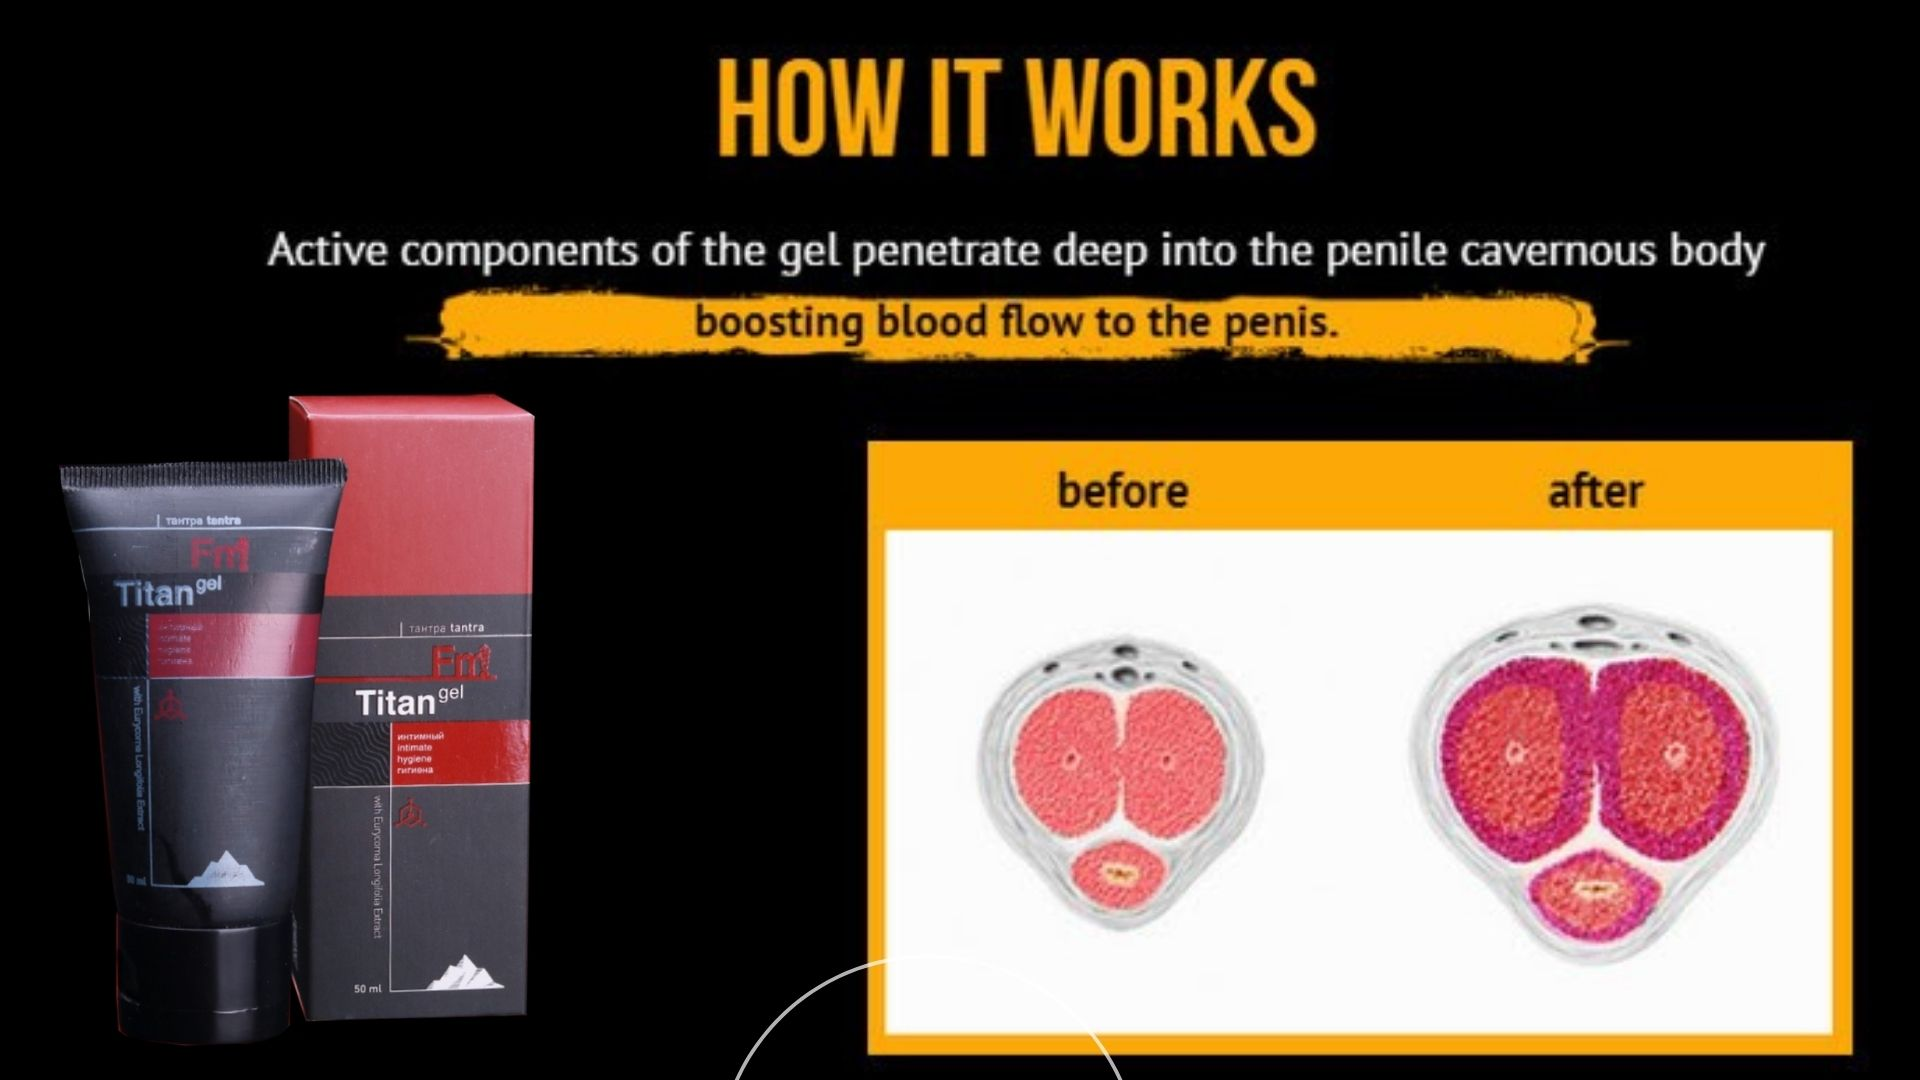 Cara Kerja Titan Gel Tantra Intimate Hygiene